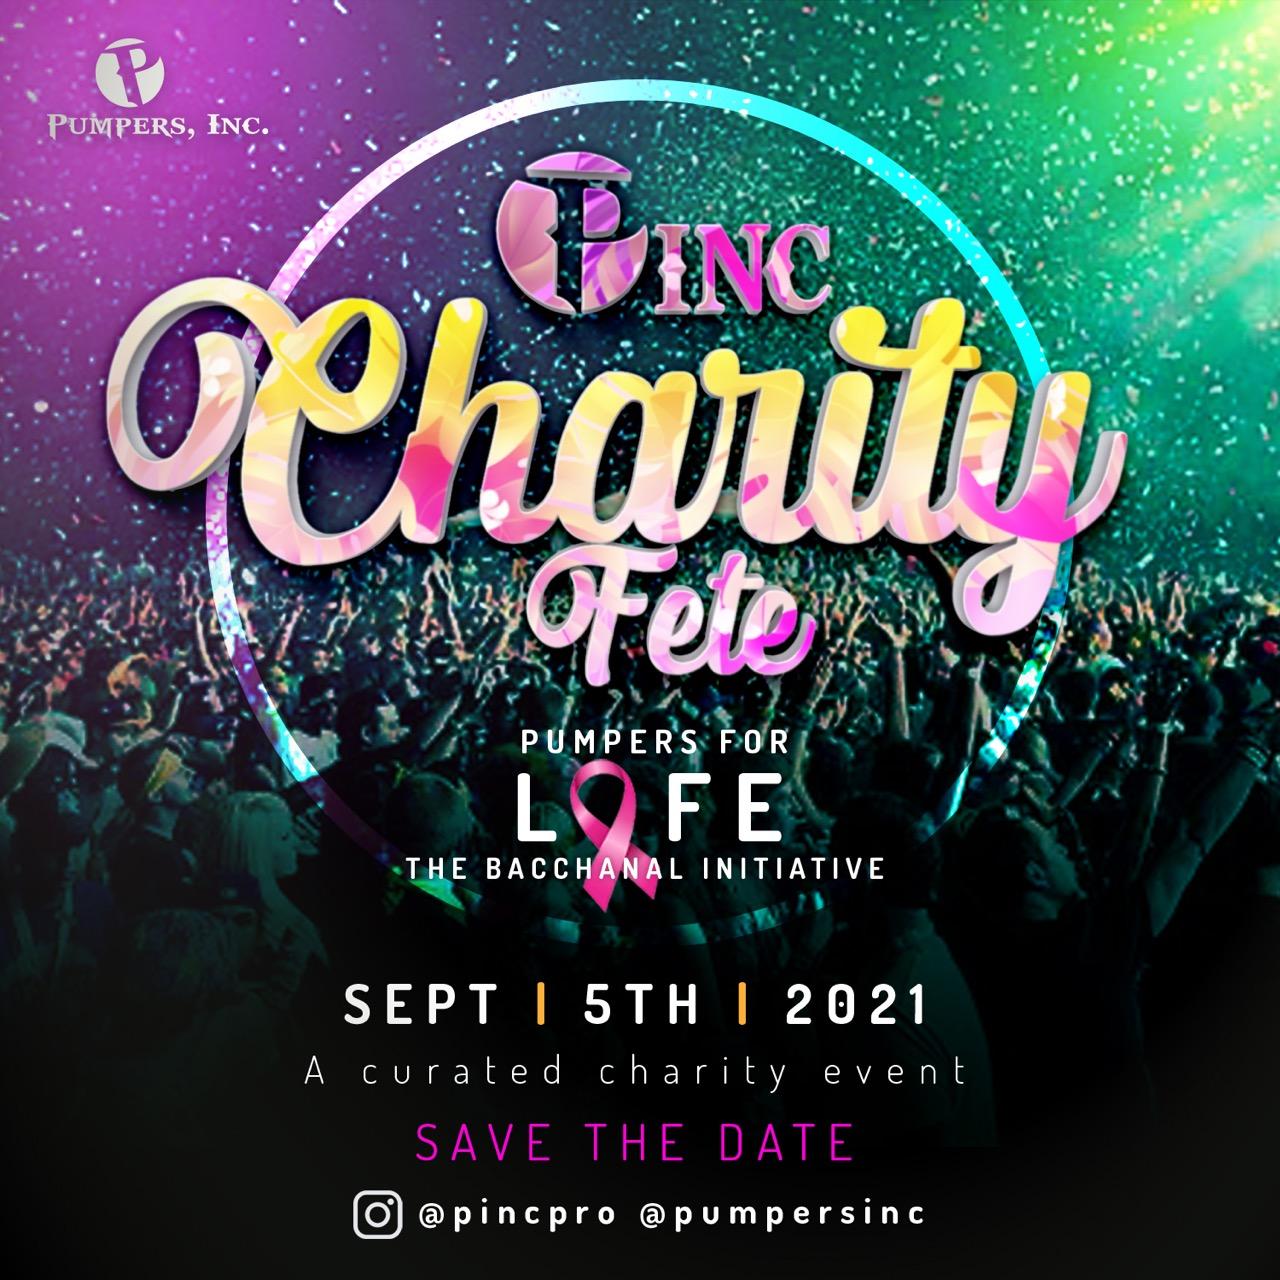 PINC Charity Fete